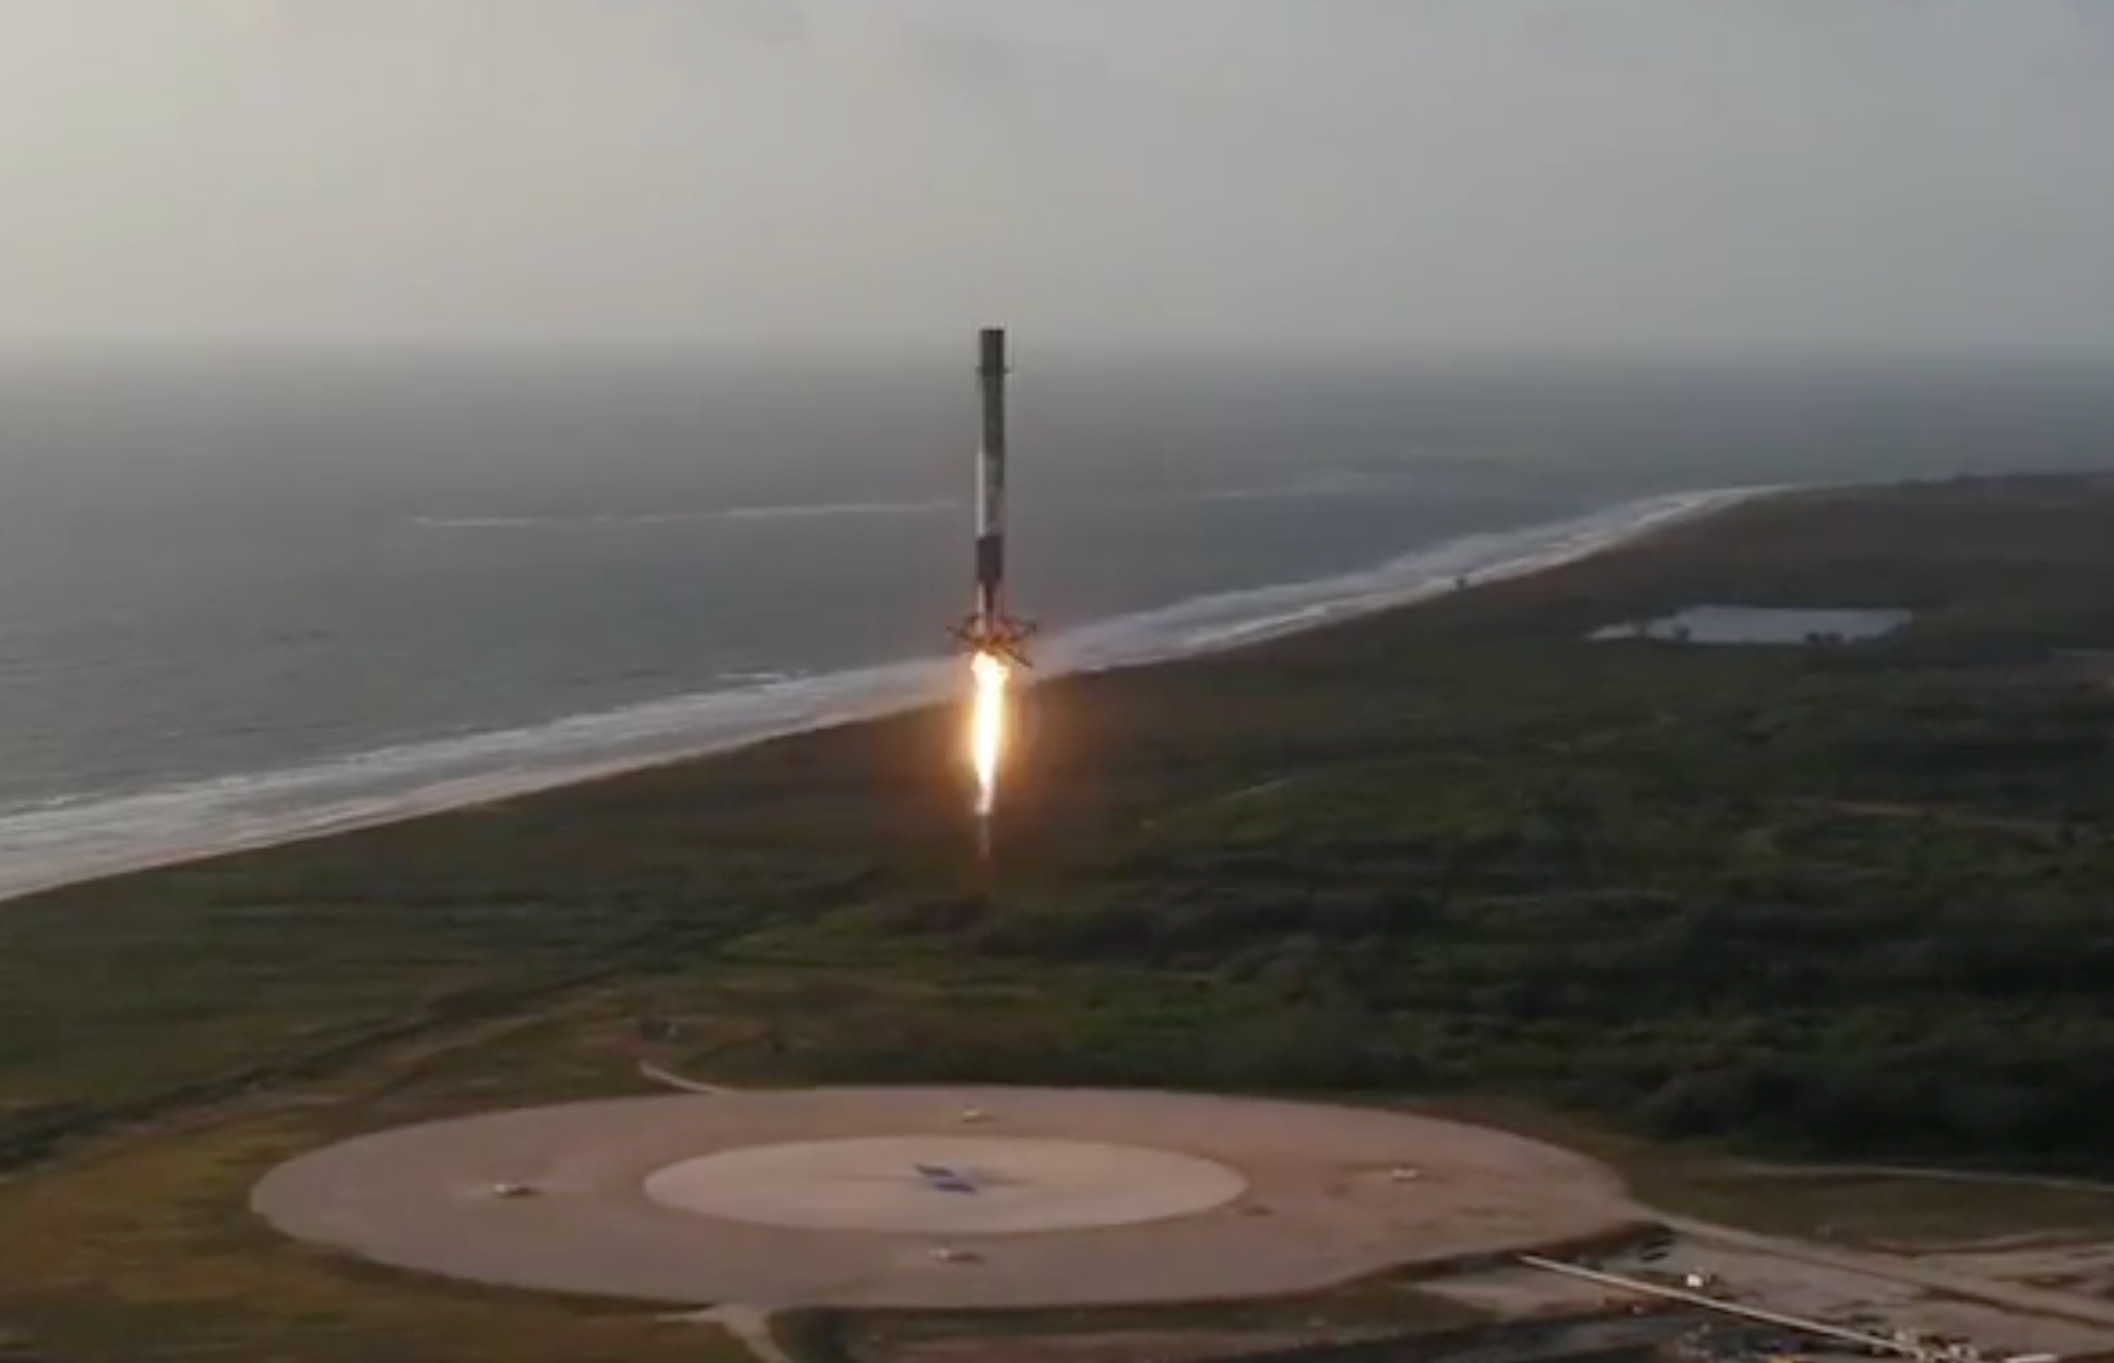 spacex-falcon9-nrol-mission-landing